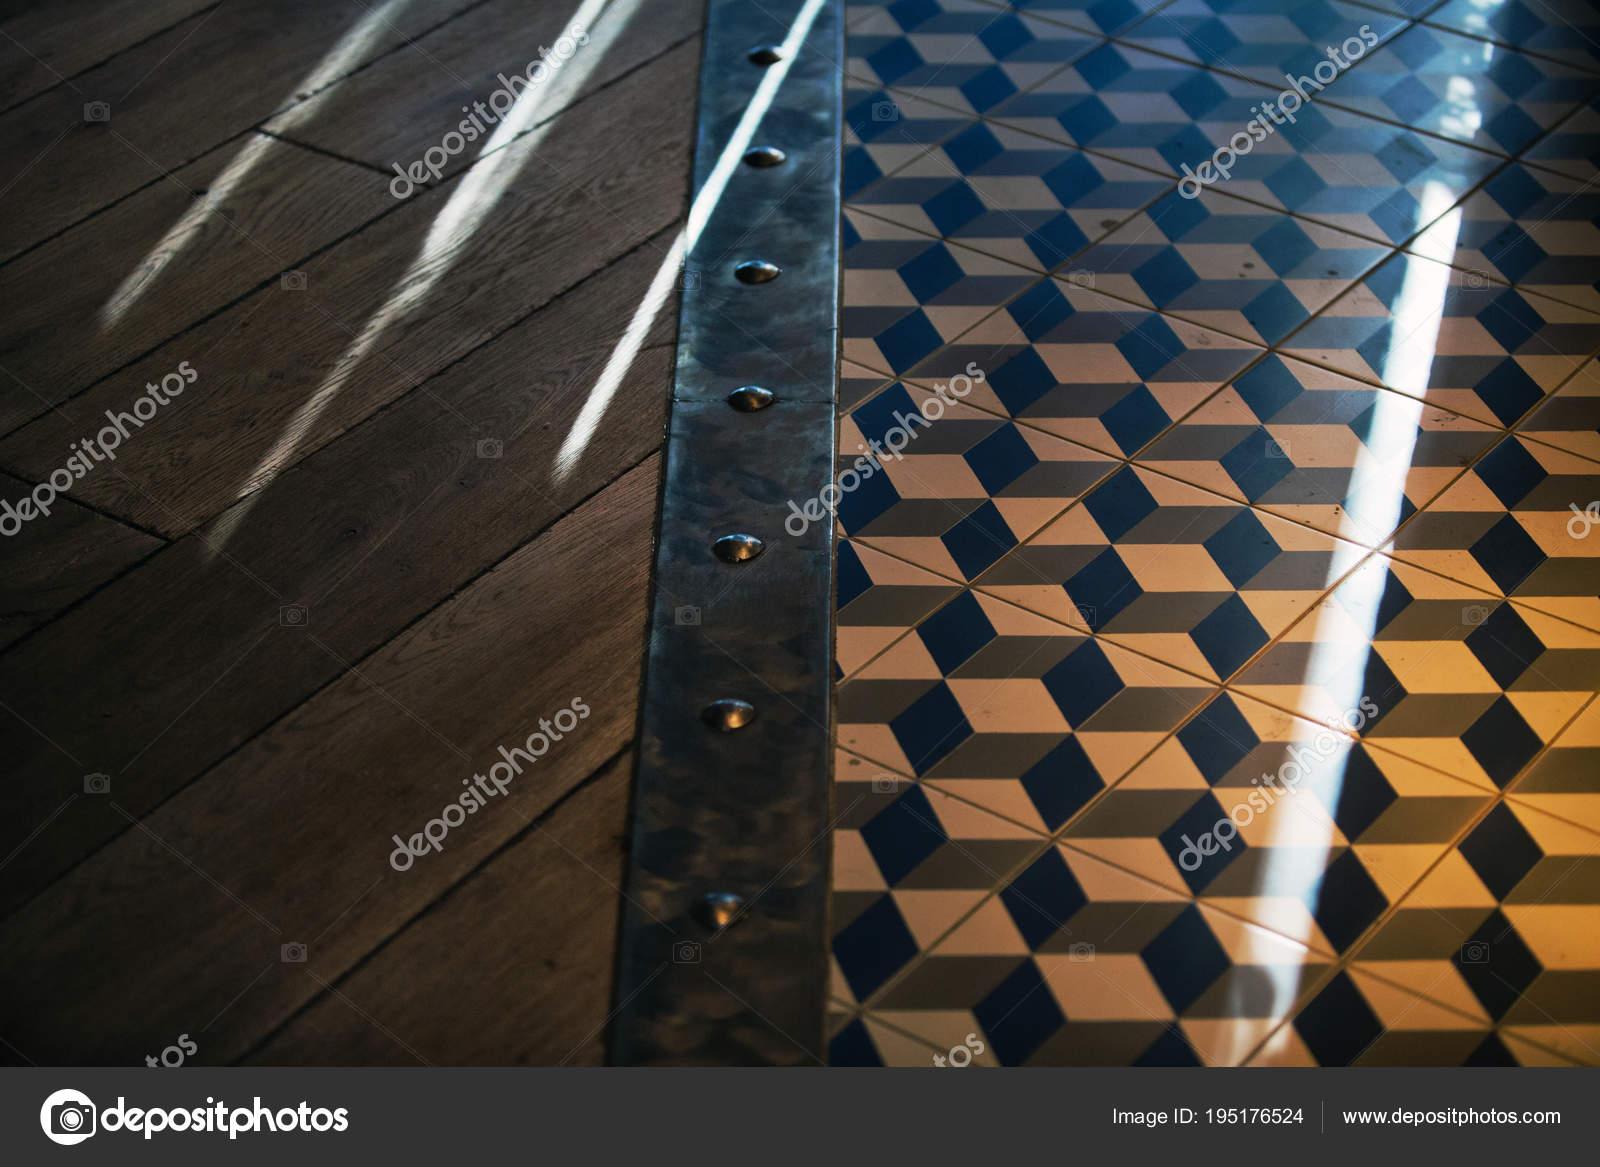 Vista elevata legno pavimento piastrelle motivi con bordo metallo